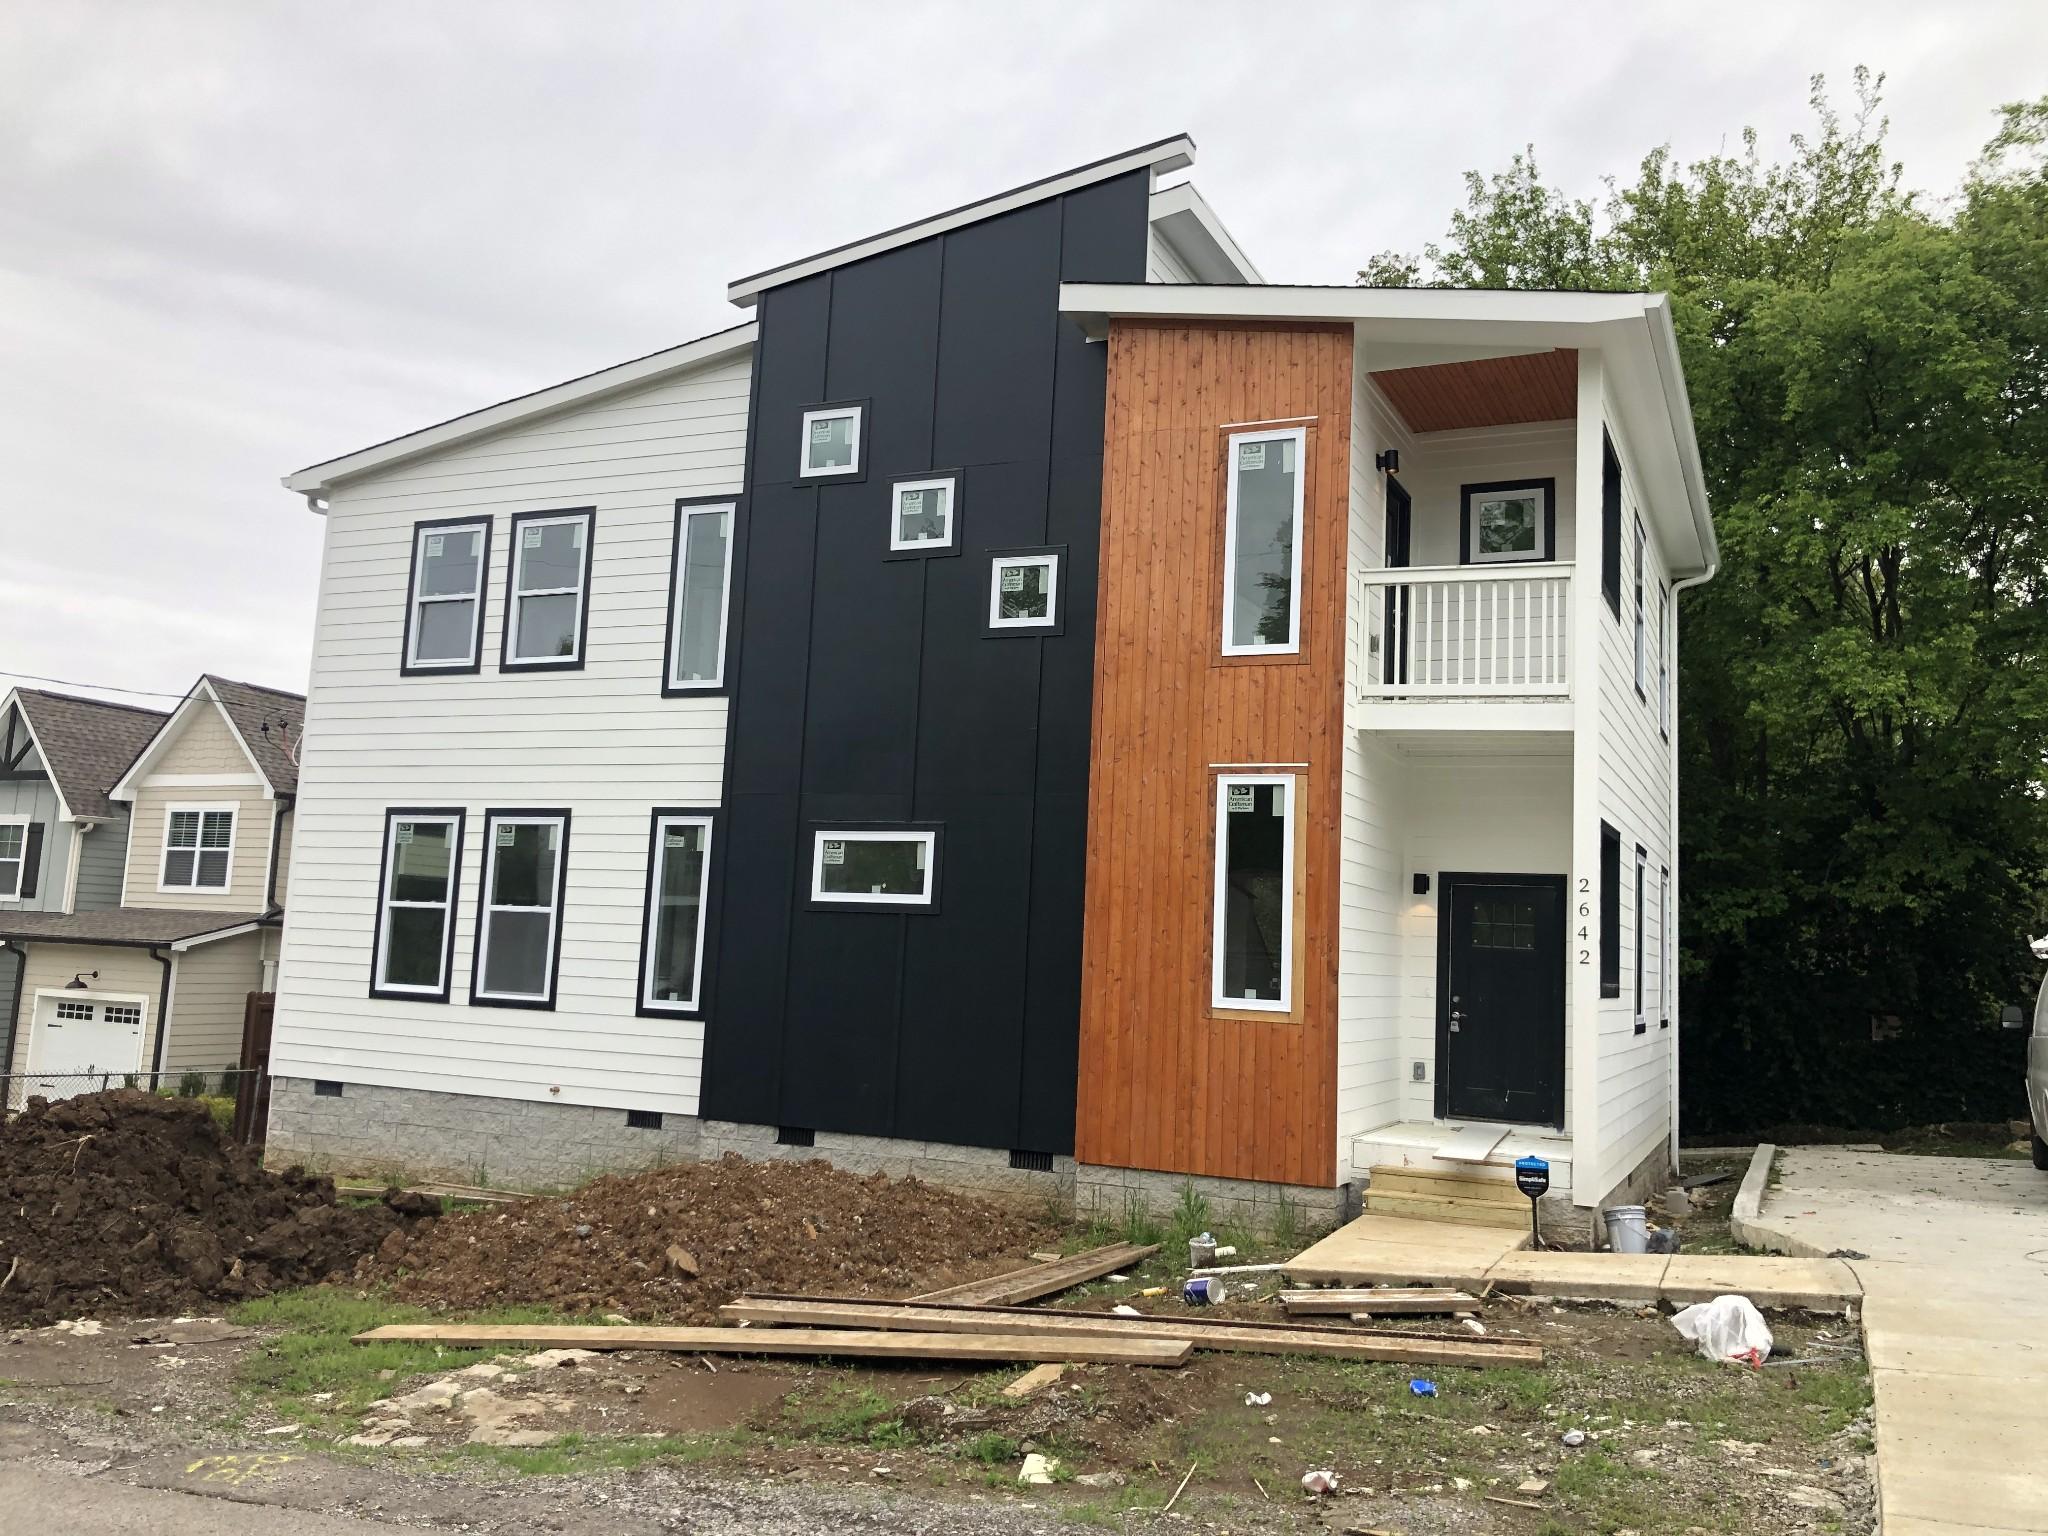 2642 Pennington Ave, Nashville, TN 37216 - Nashville, TN real estate listing